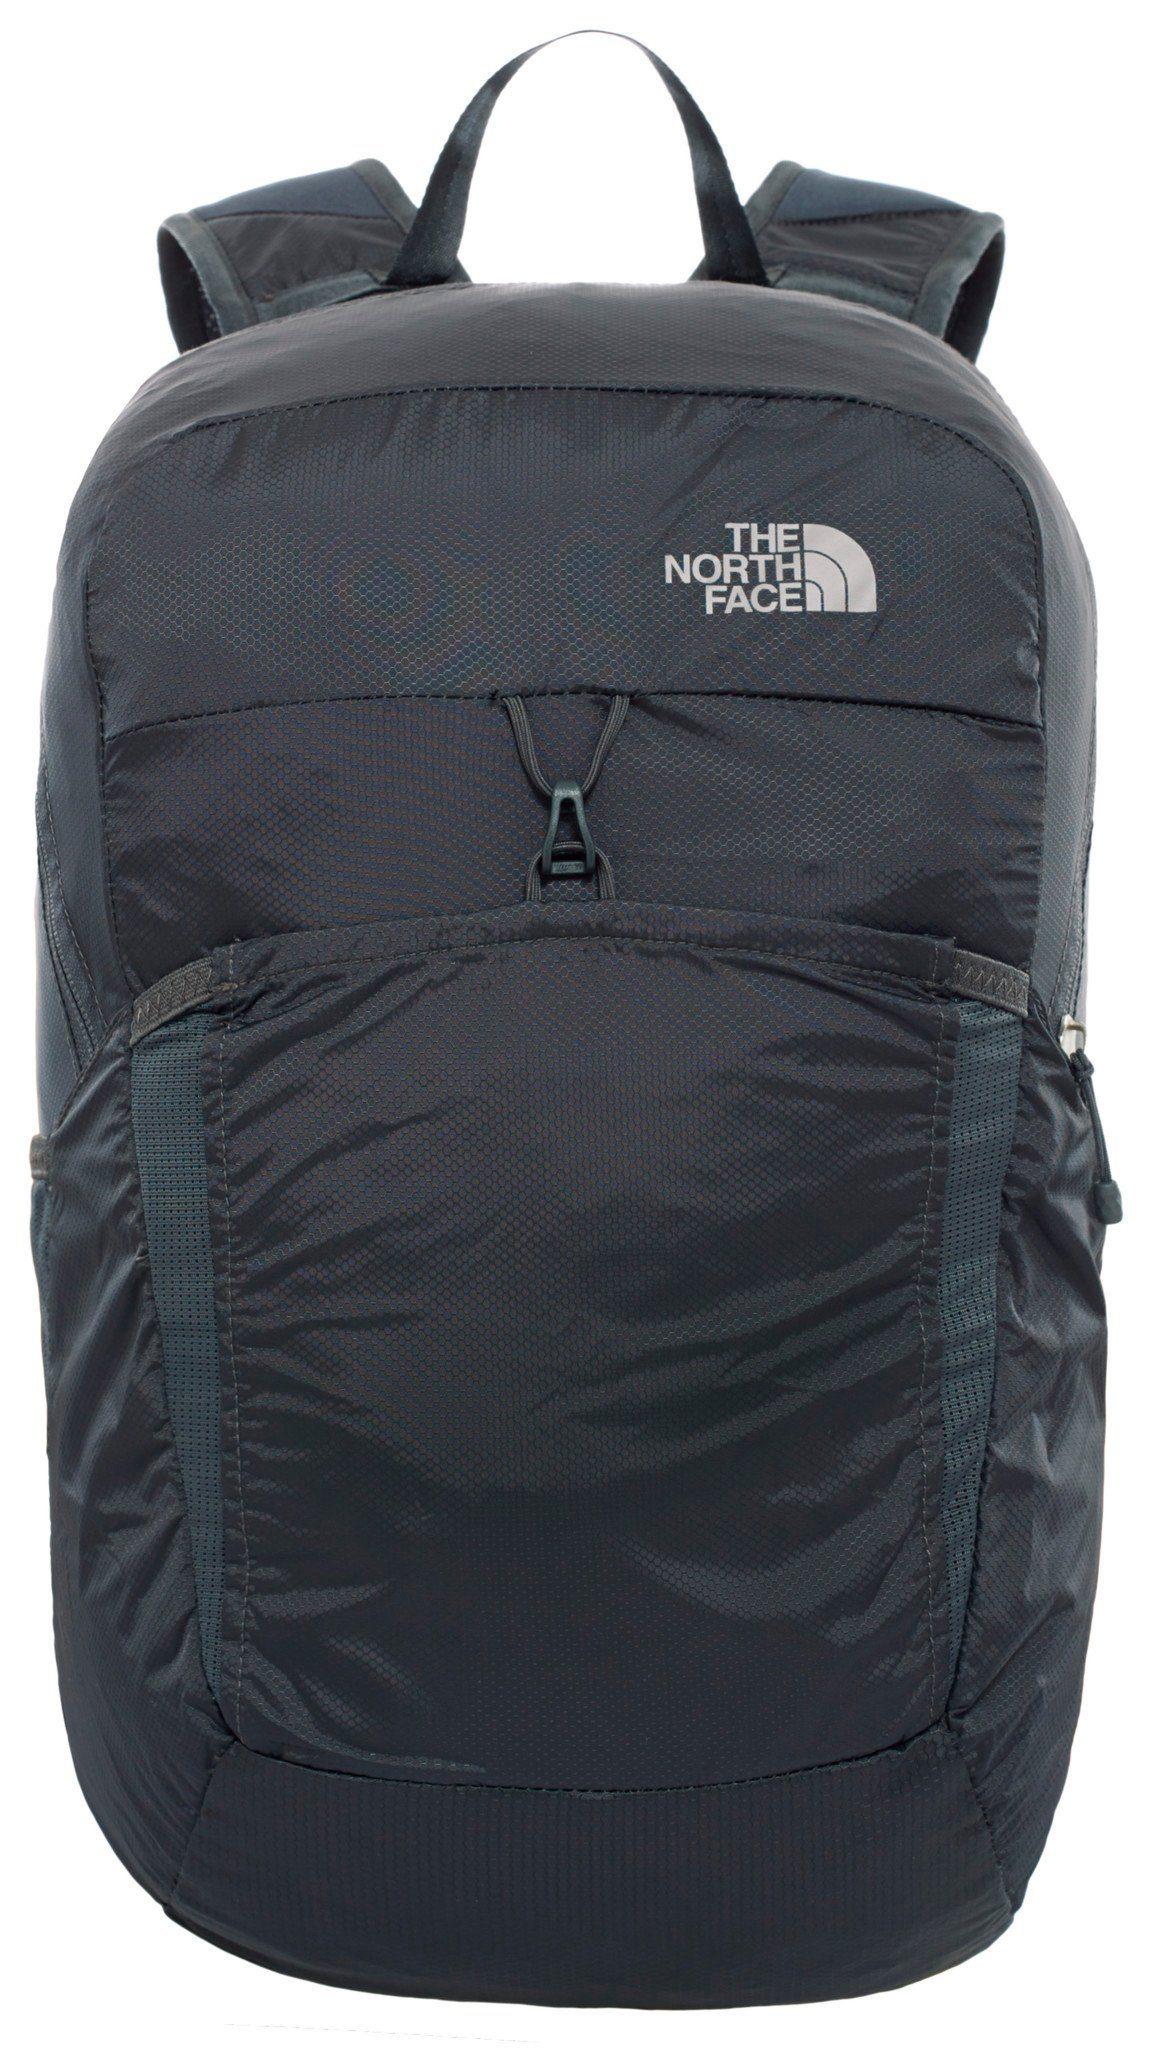 The North Face Wanderrucksack »Flyweight Pack 17 L«